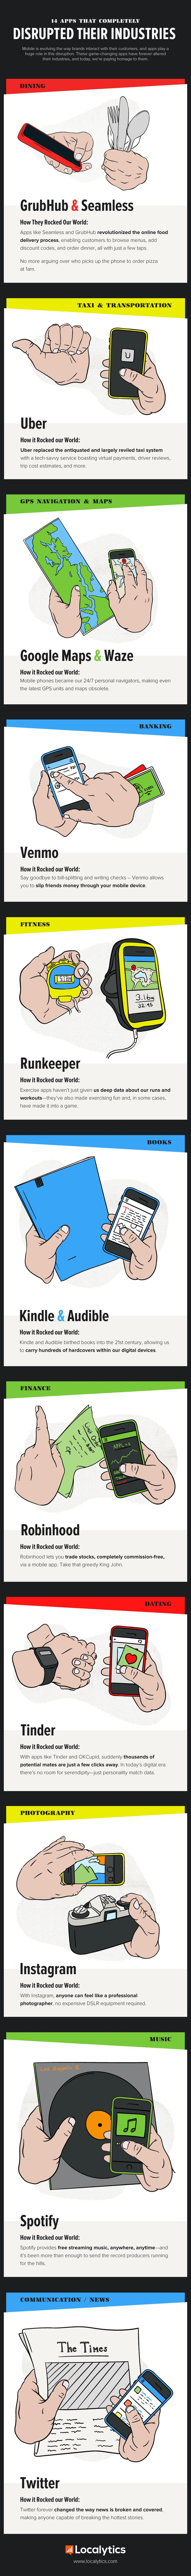 infografik disruptive apps